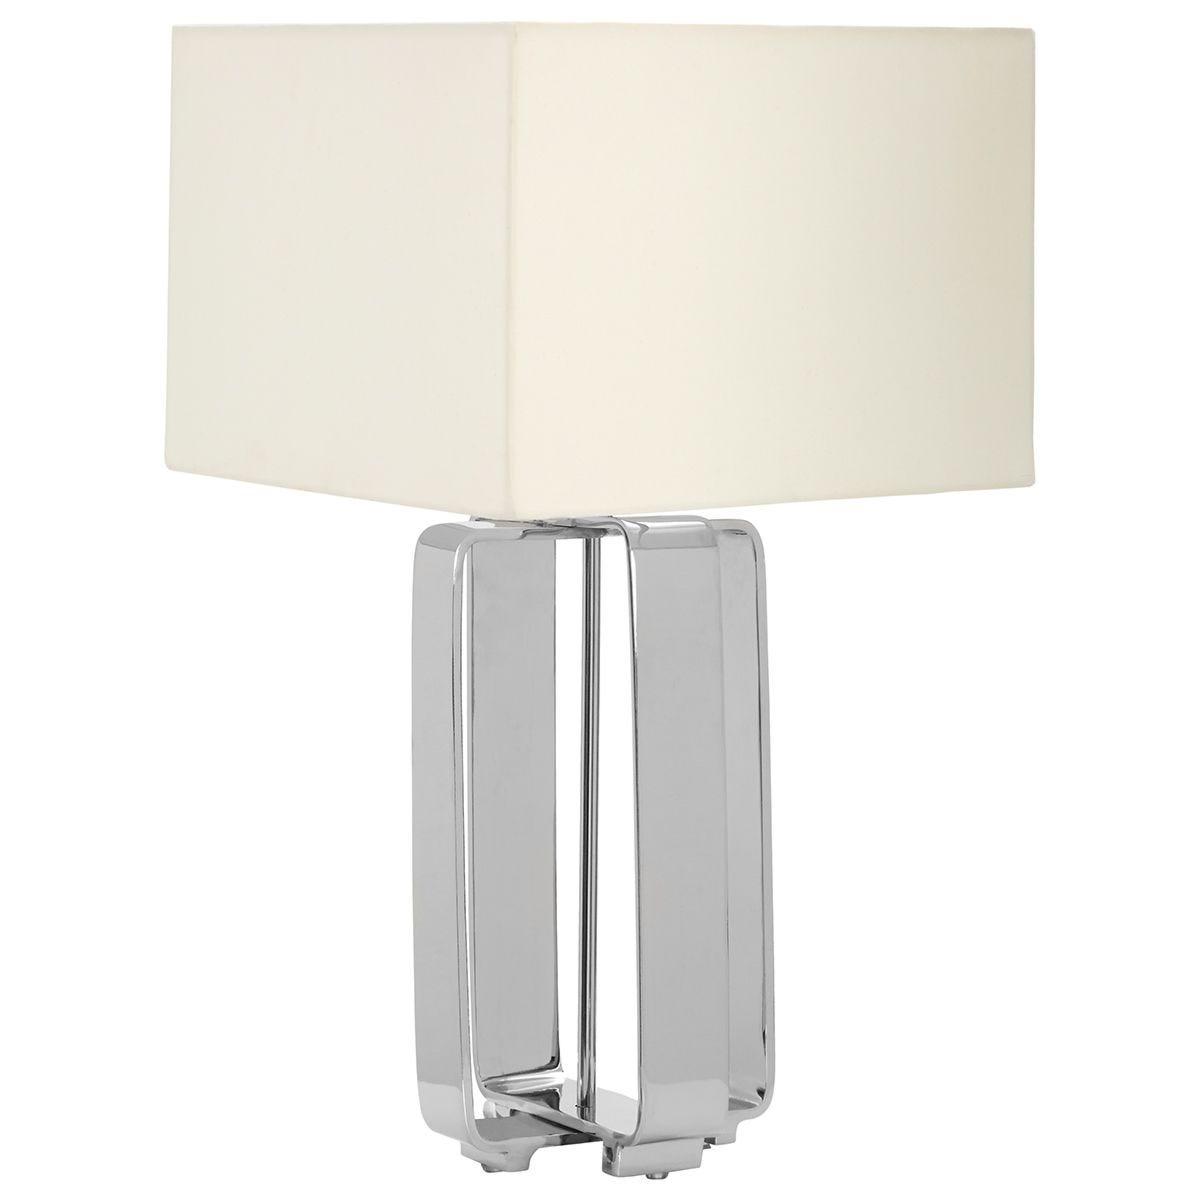 Premier Housewares Argent Table Lamp Aluminium Base Cream Fabric Shade